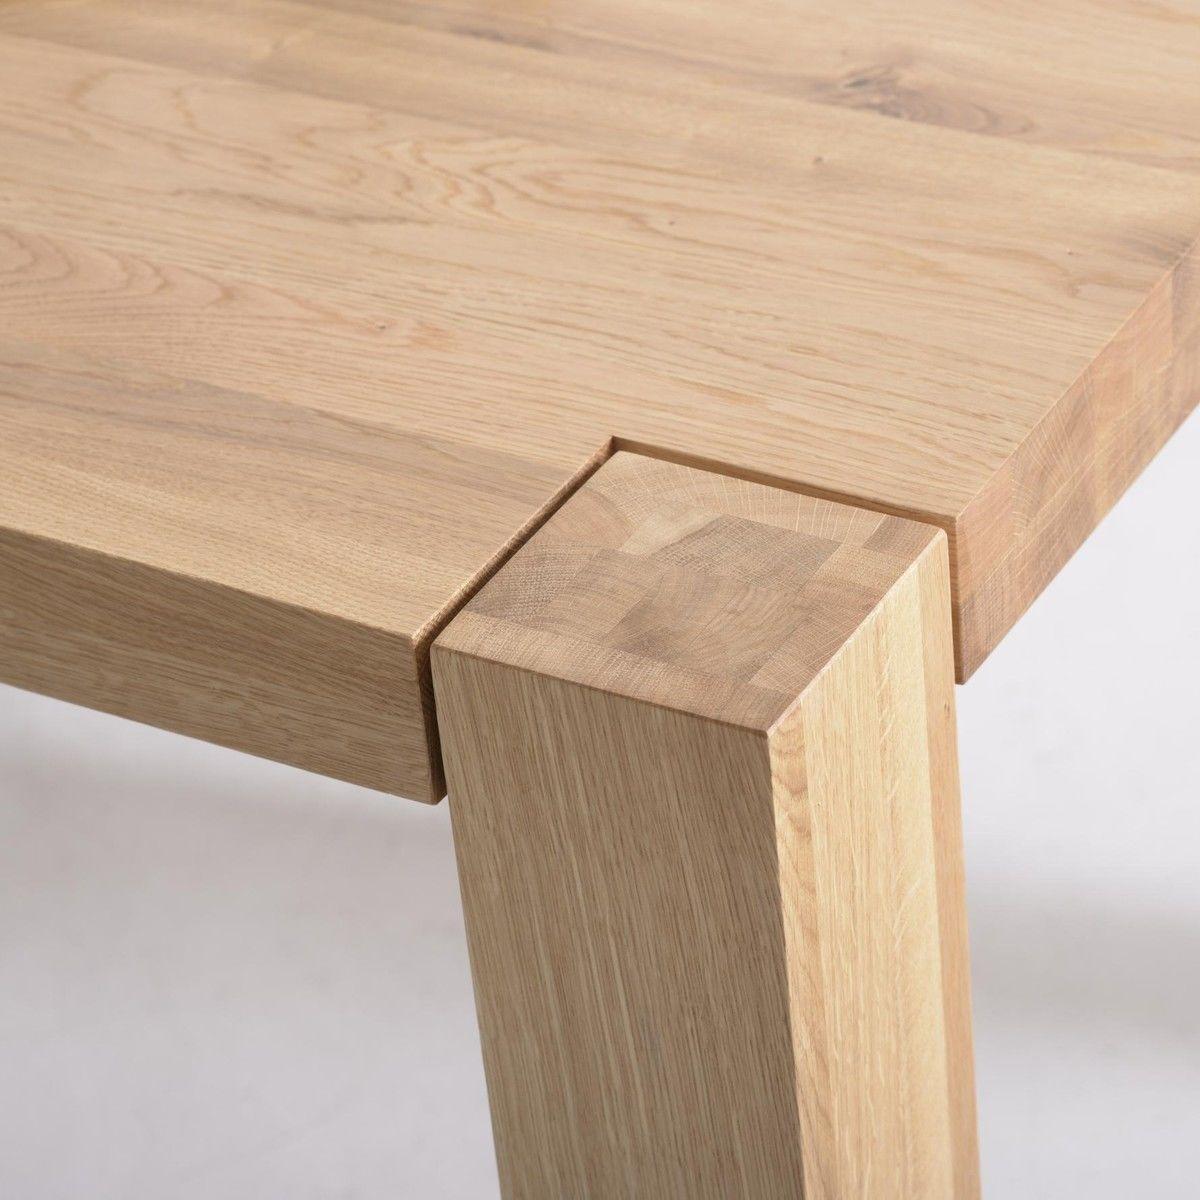 Mr Big Solid Wood Bench Adwood